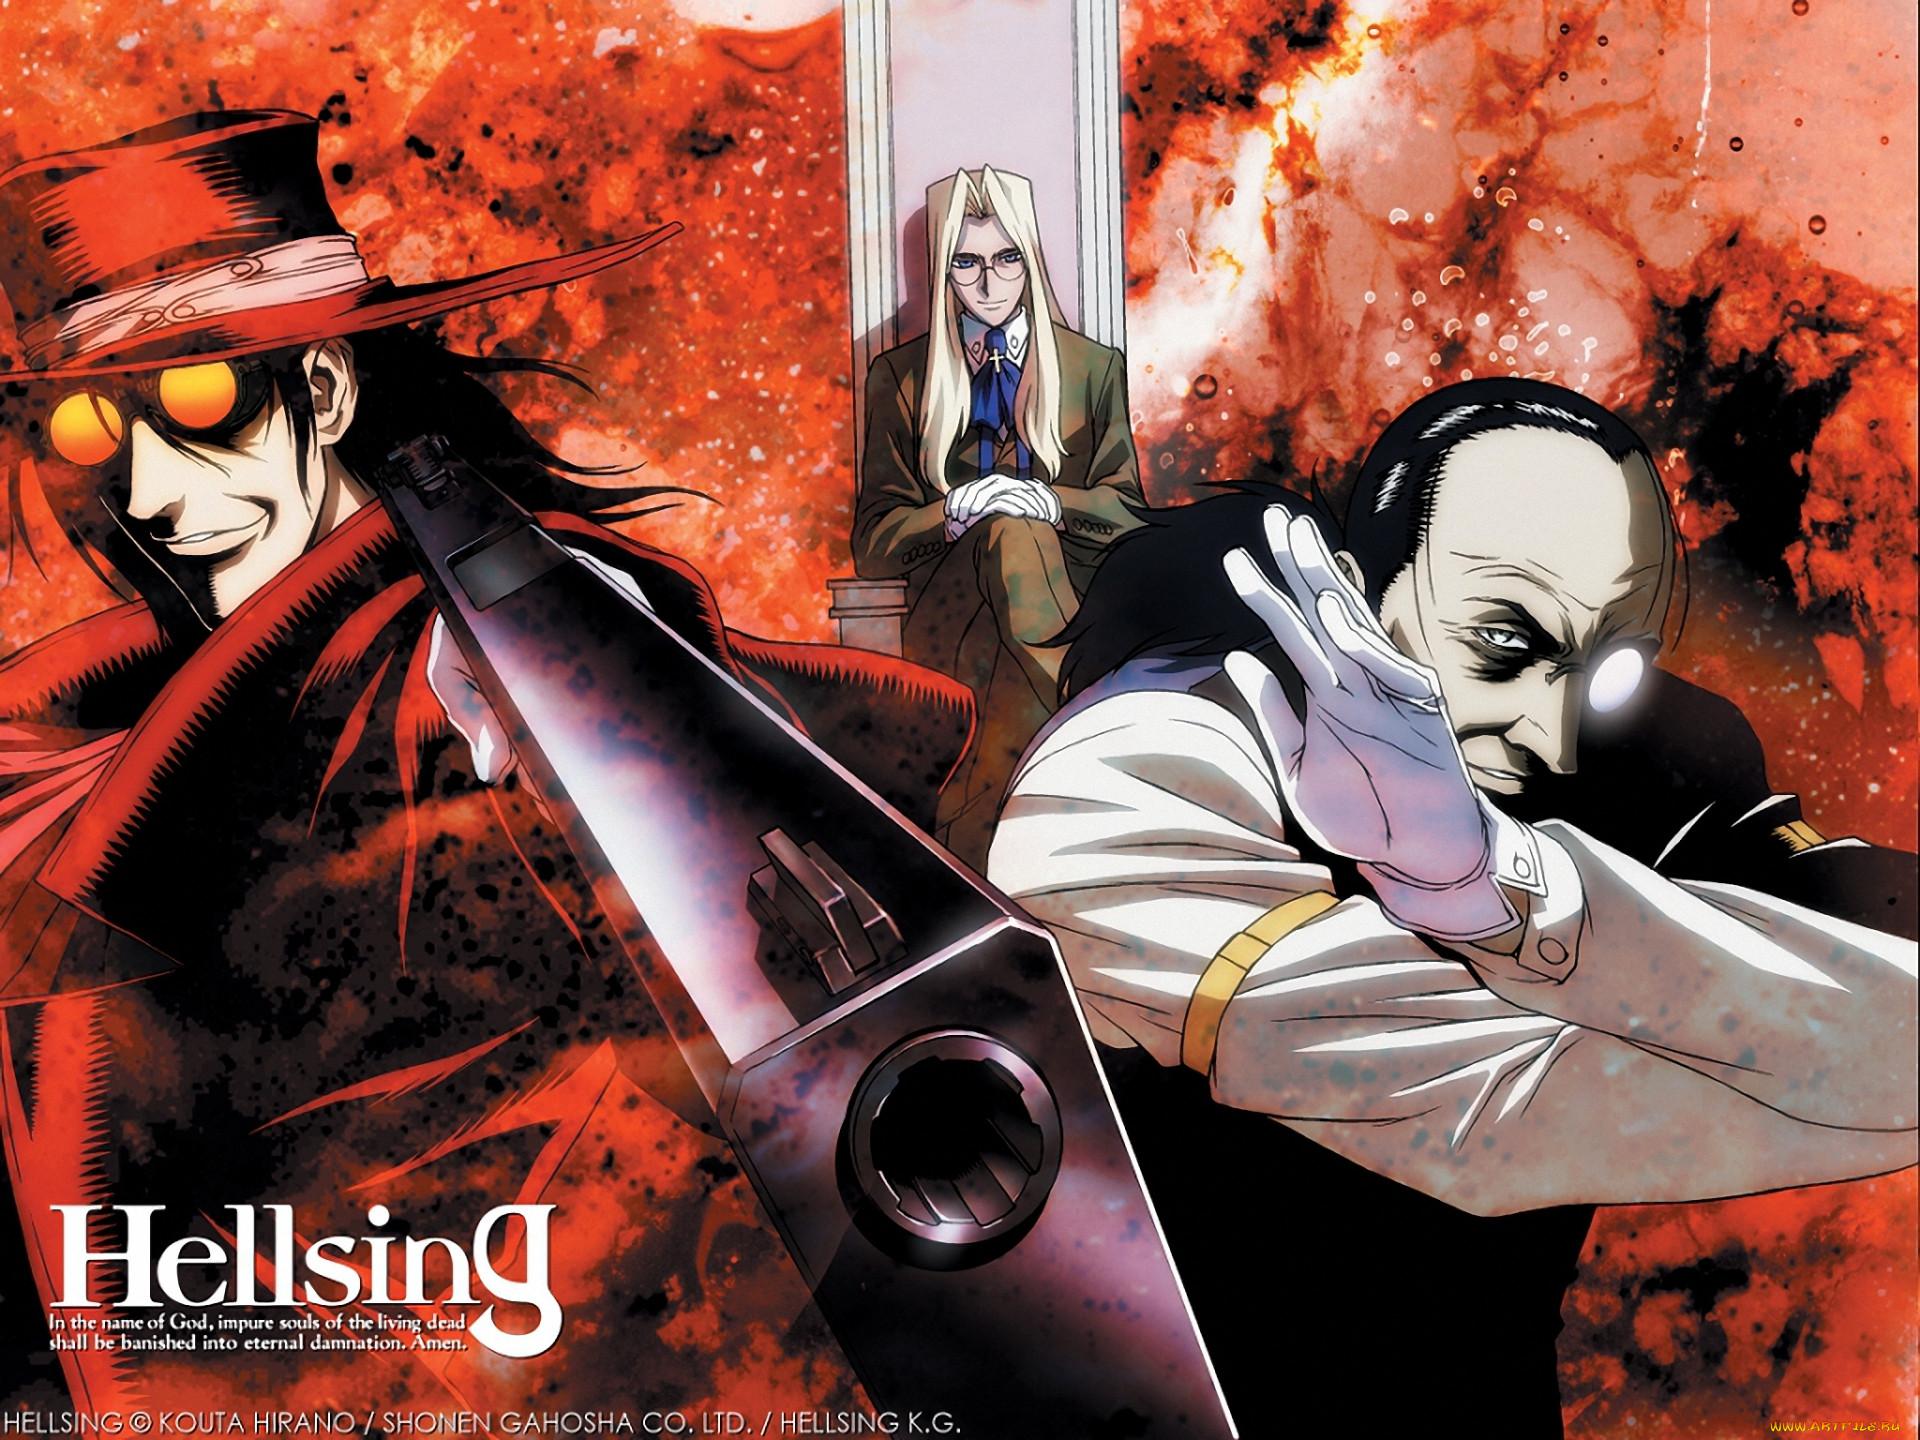 аниме, hellsing, алукард, integra, оружие, дракула, walter, alucard, vampire